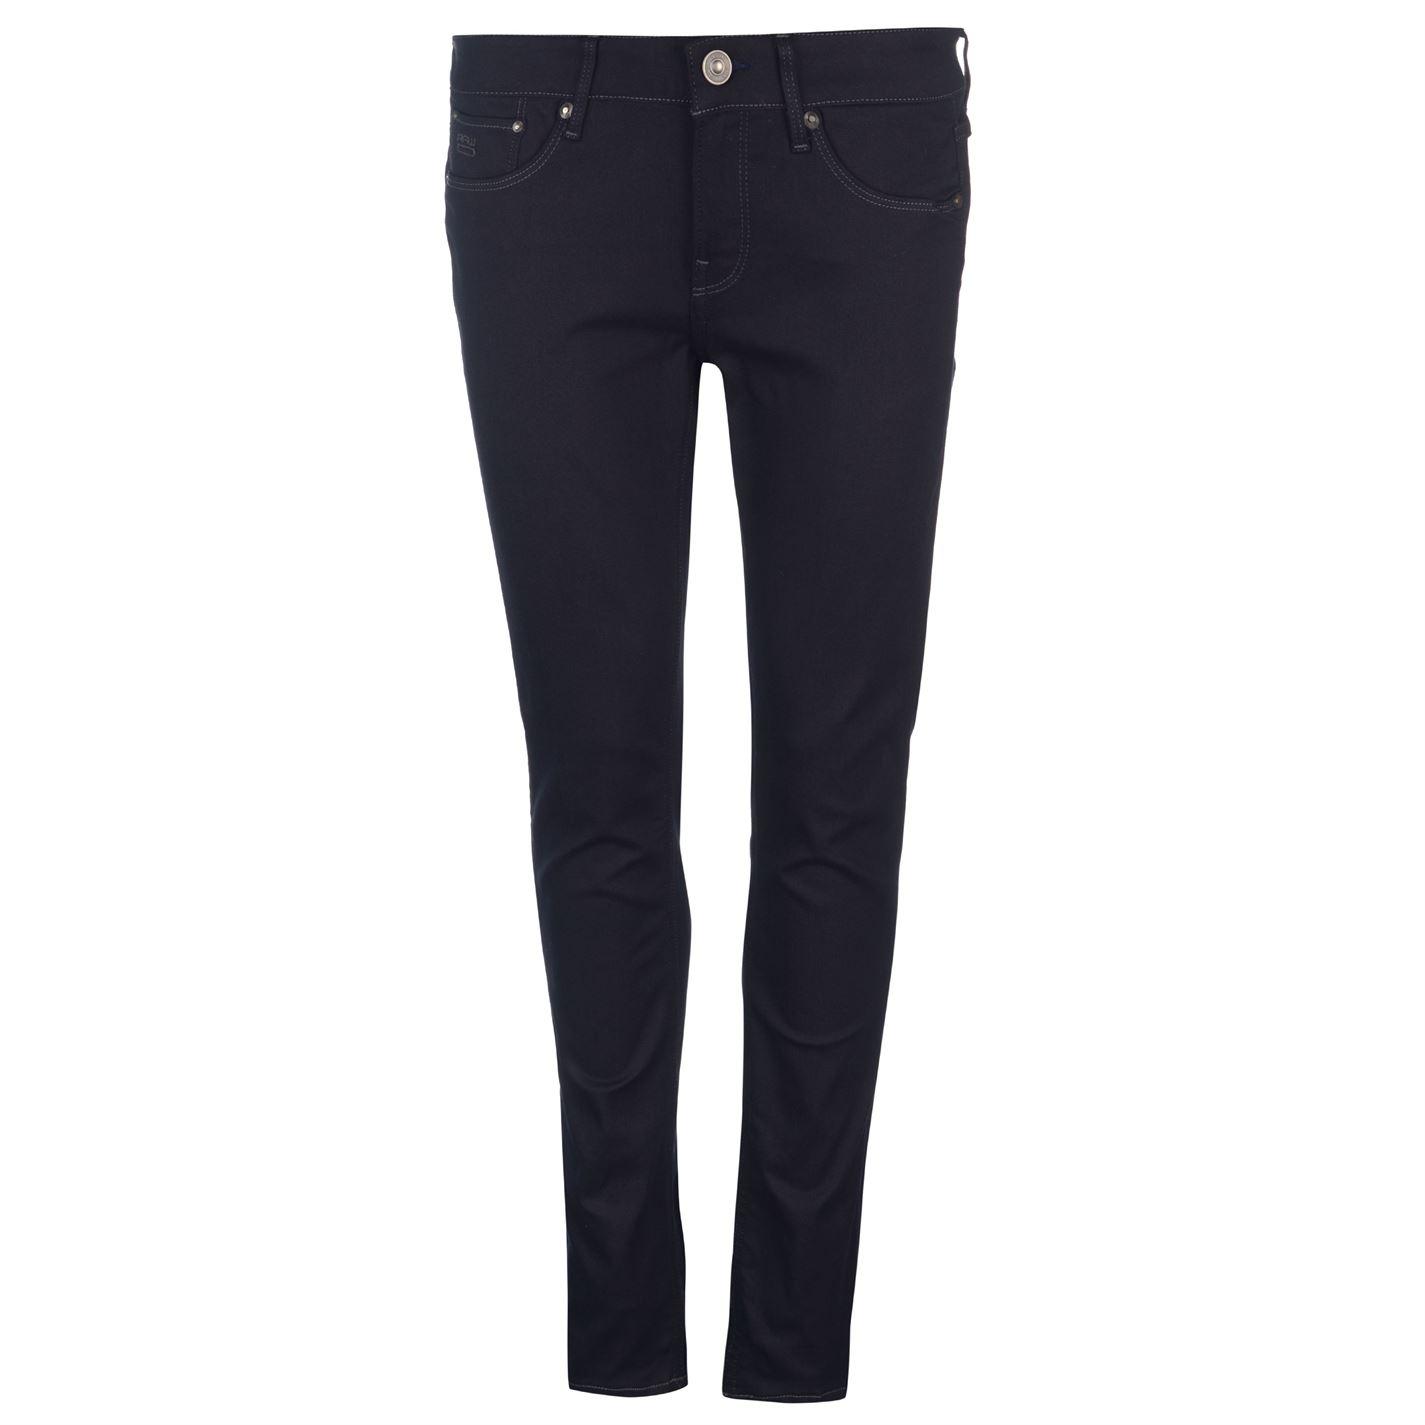 G Star 60654 Jeans